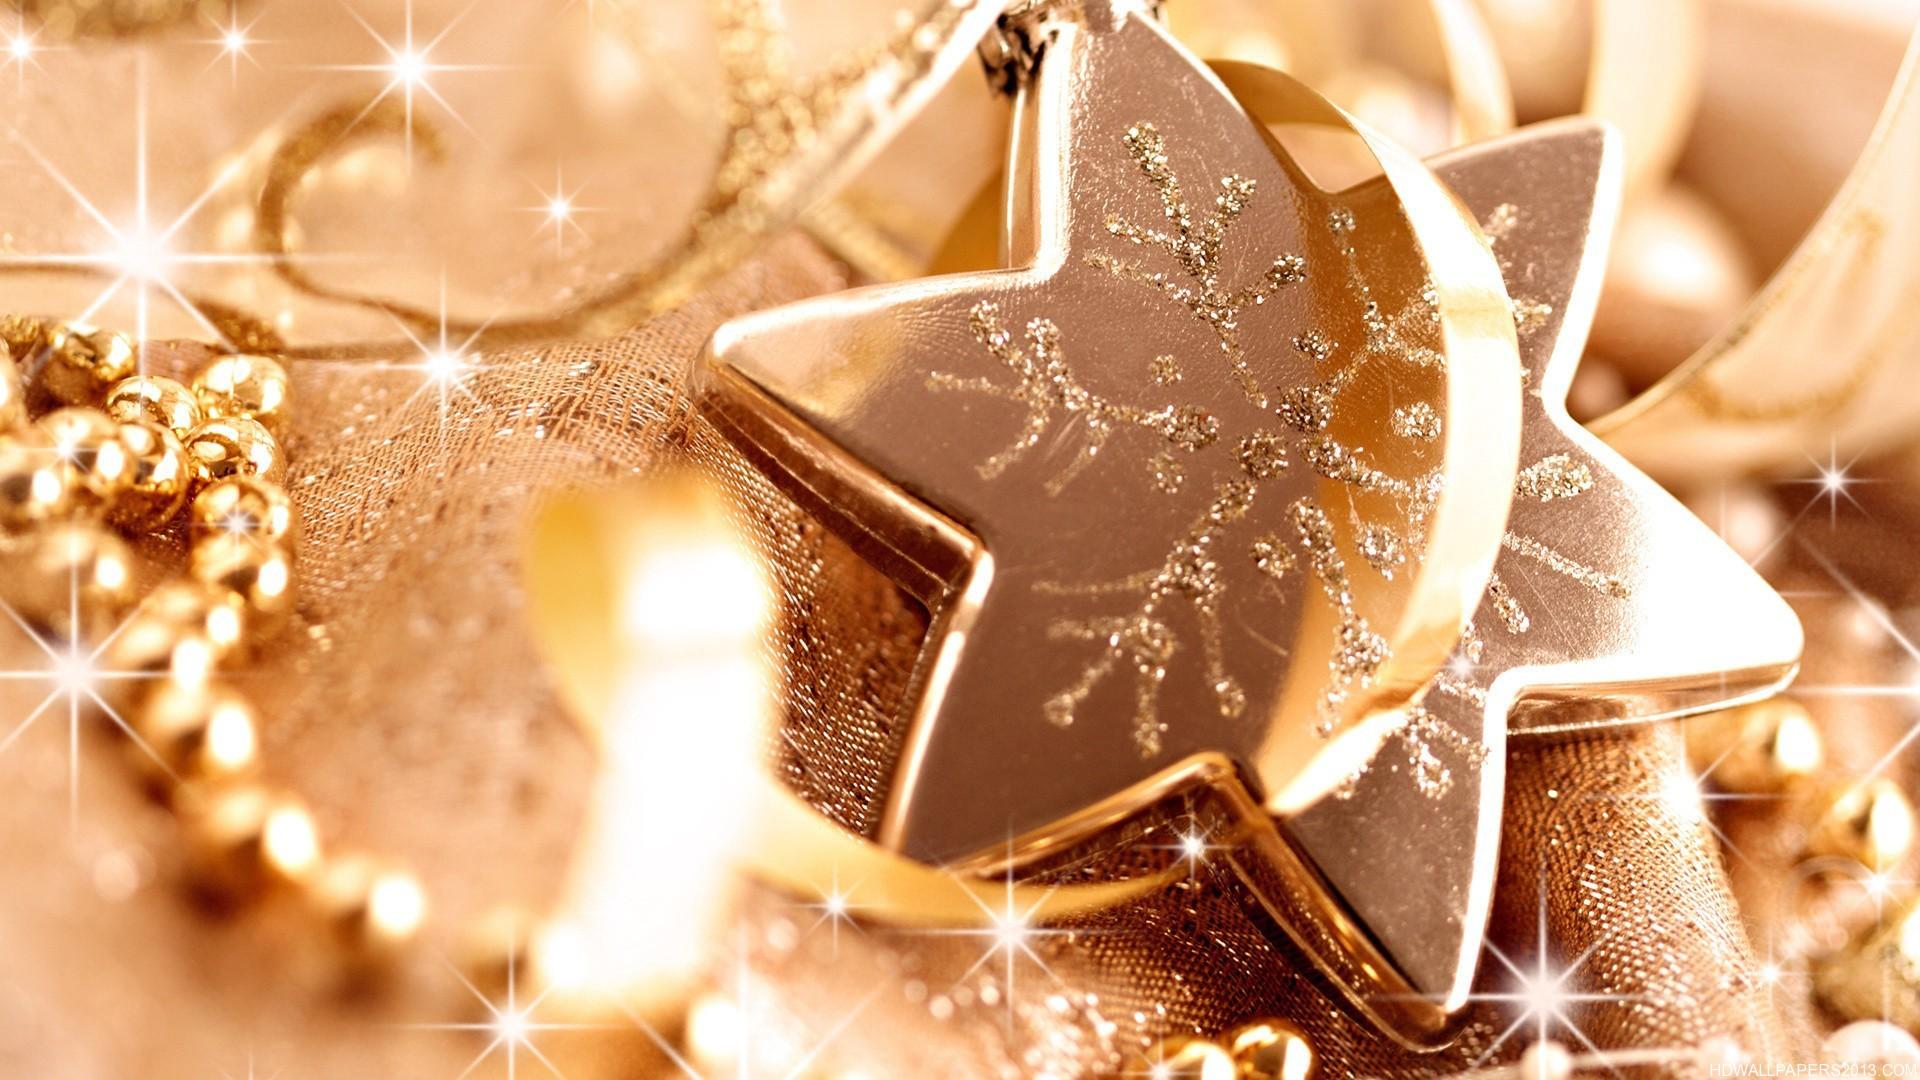 Glittery Christmas Star Wallpaper